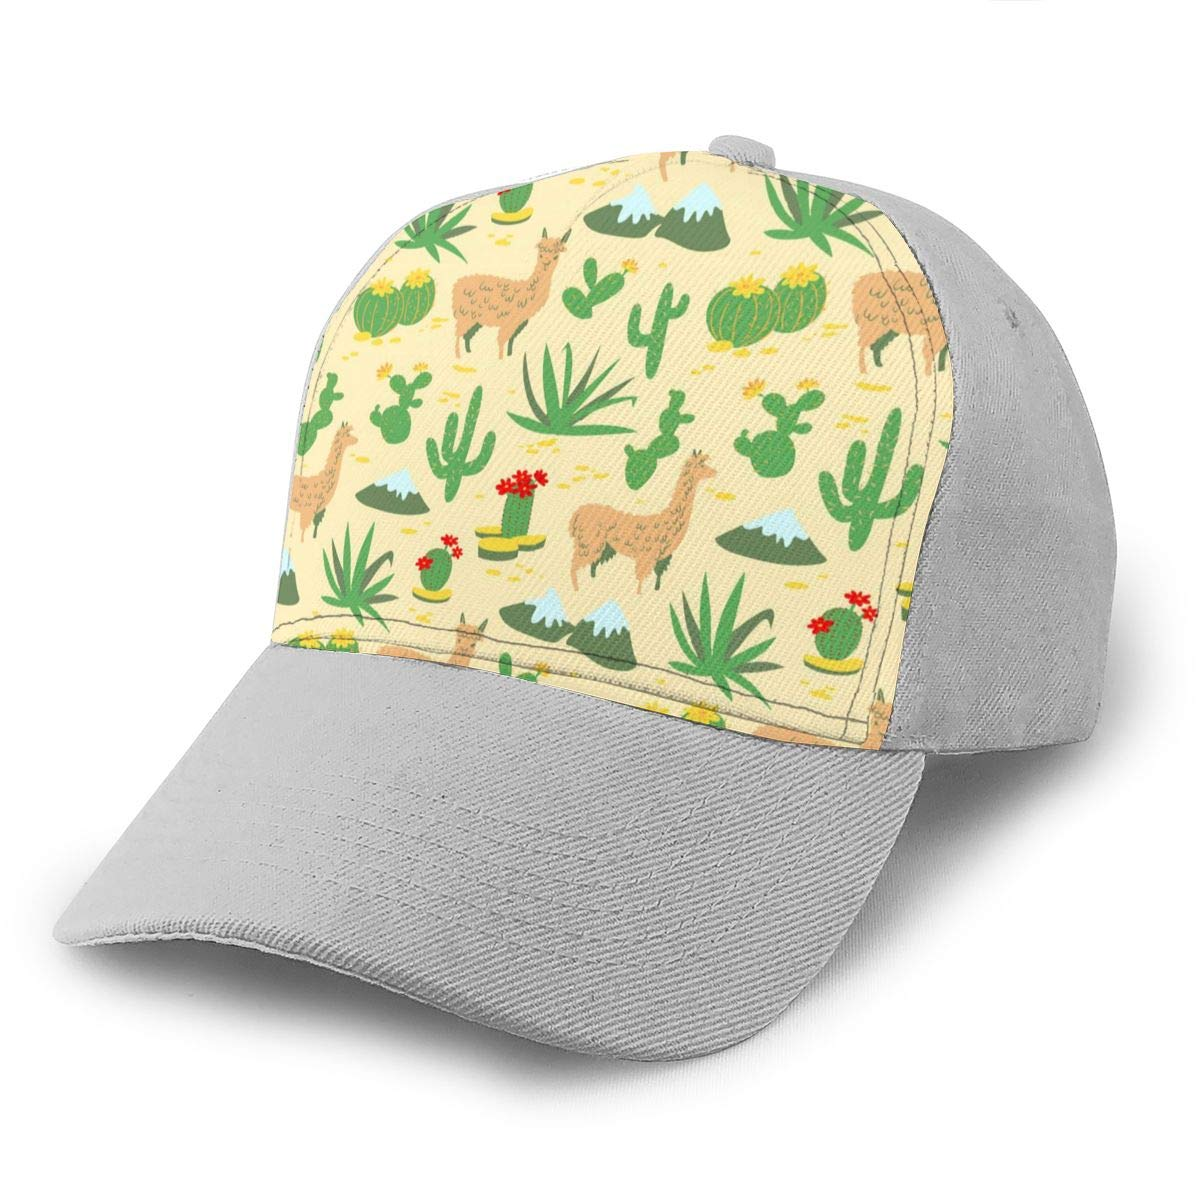 Classic Comfortable Alpaca and Cactus Humor Adjustable Baseball Cap